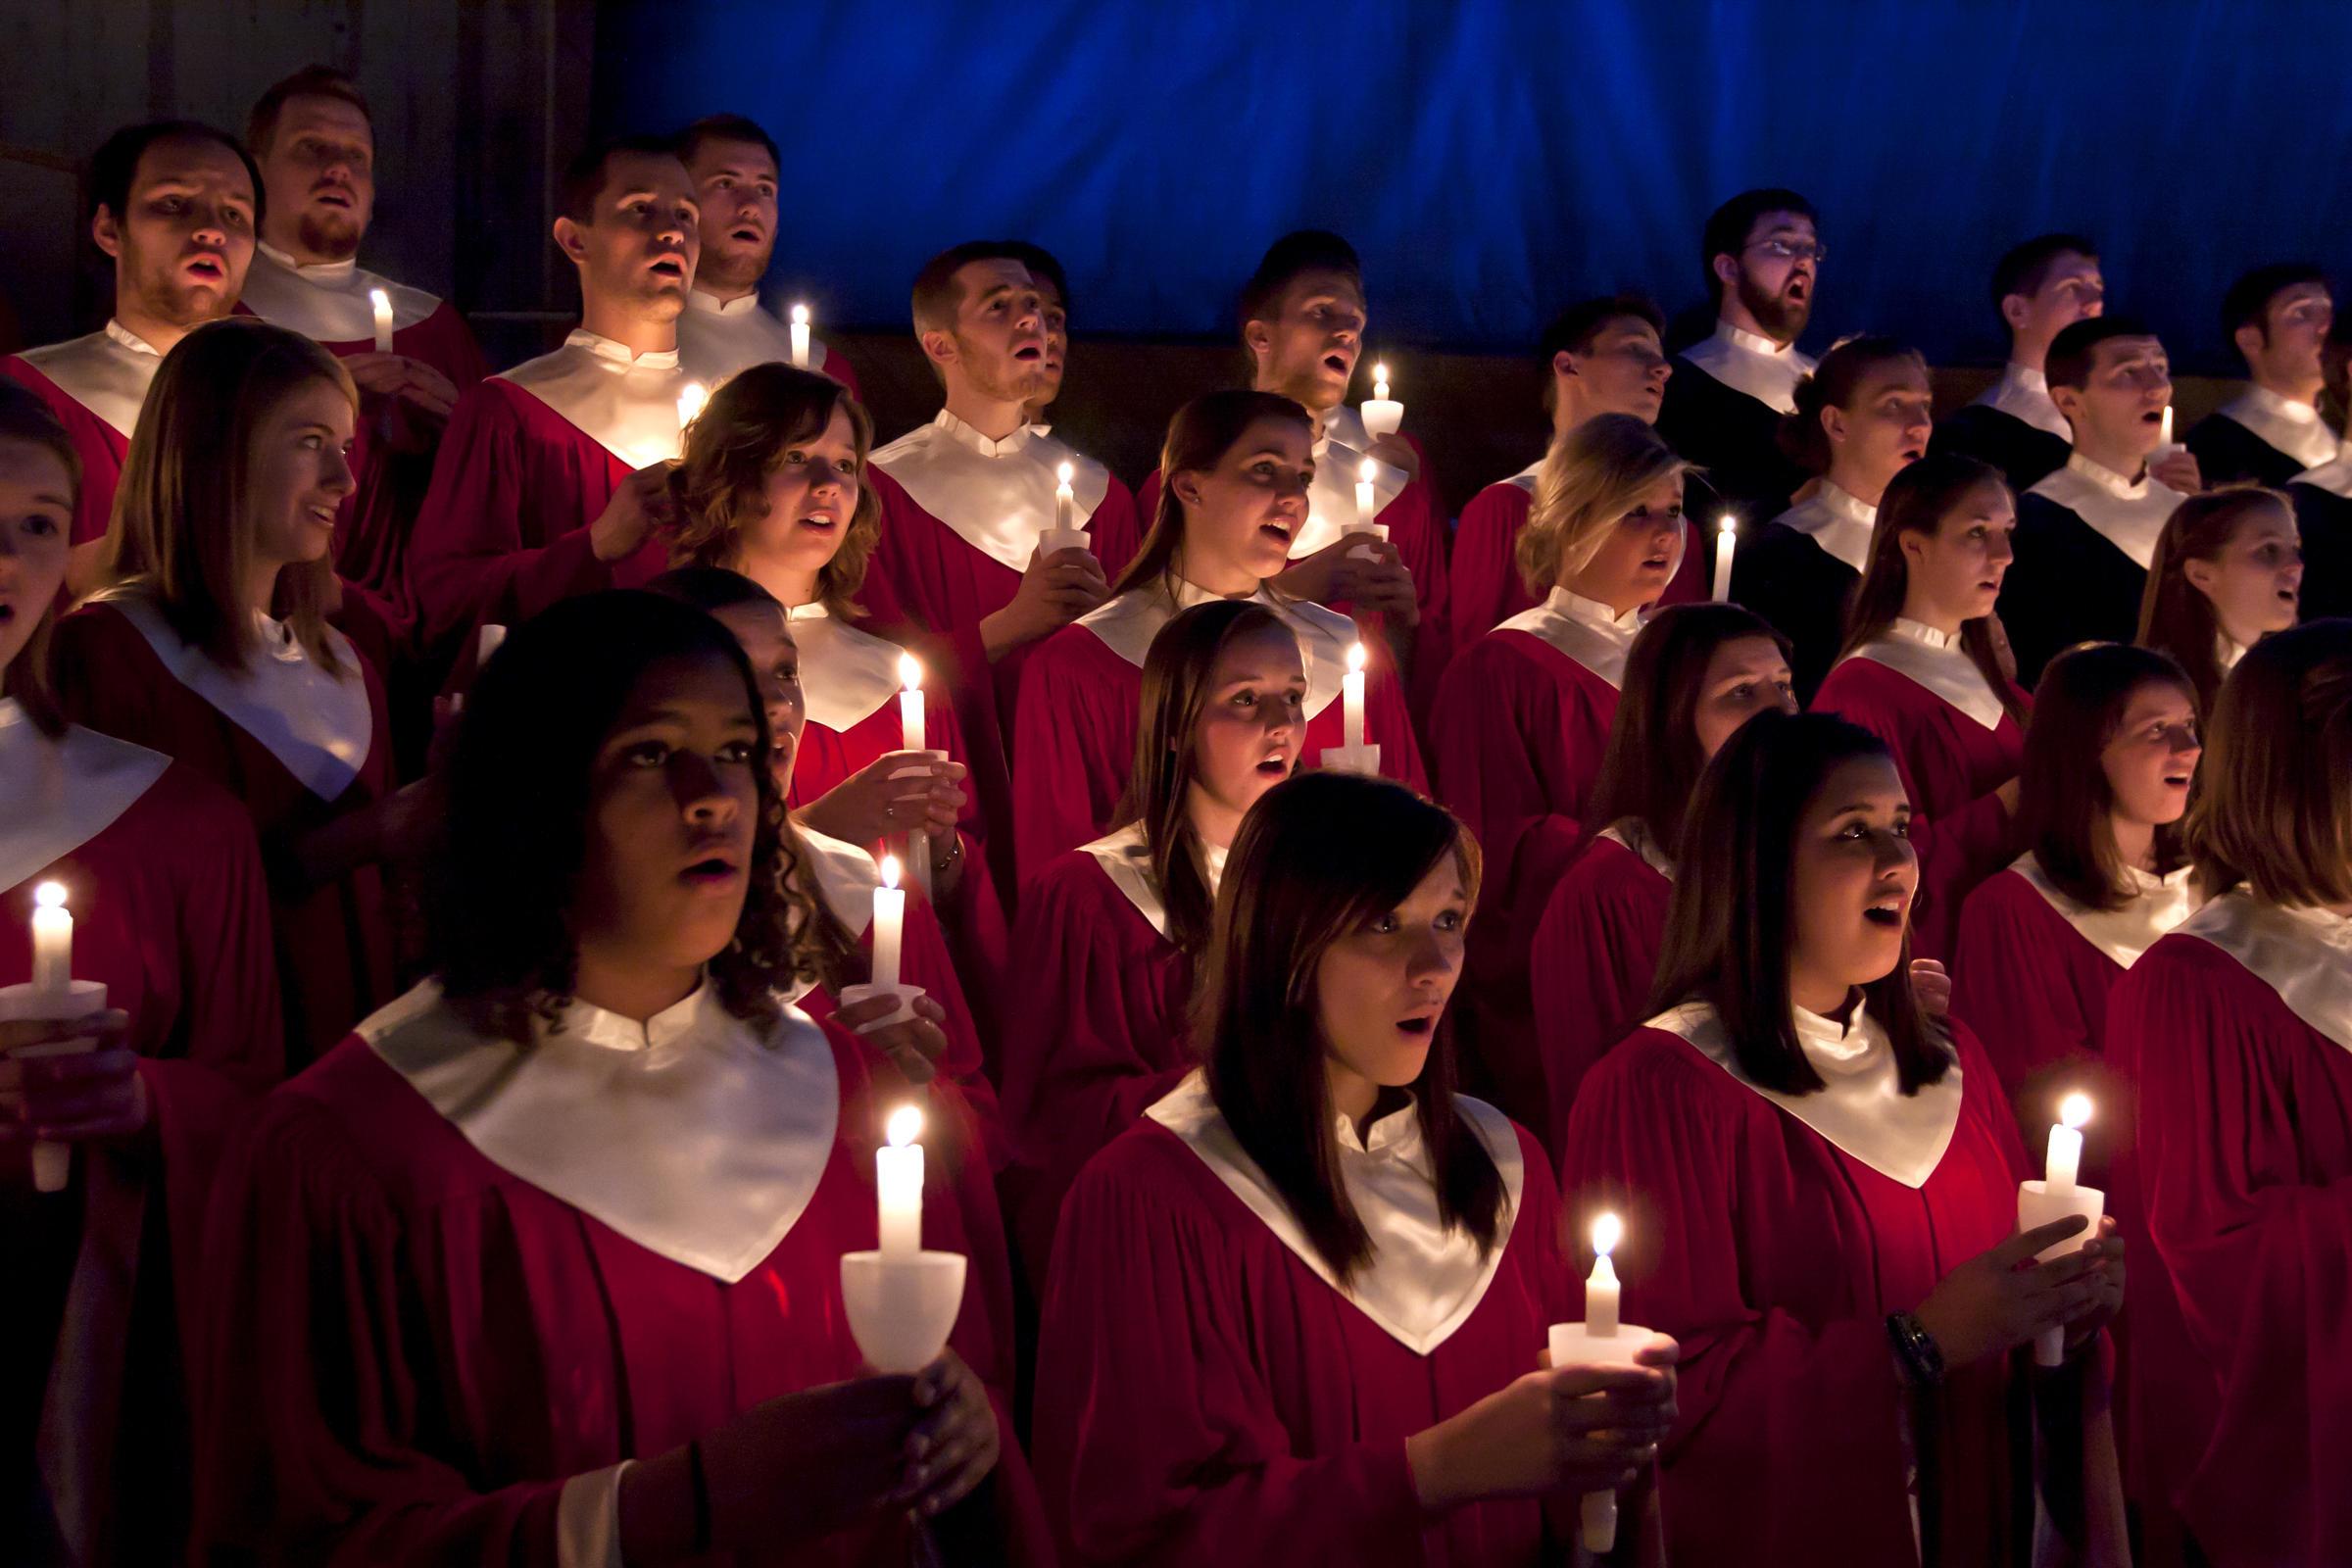 Christmas Choir.Christmas Choirs Abound West Virginia Public Broadcasting